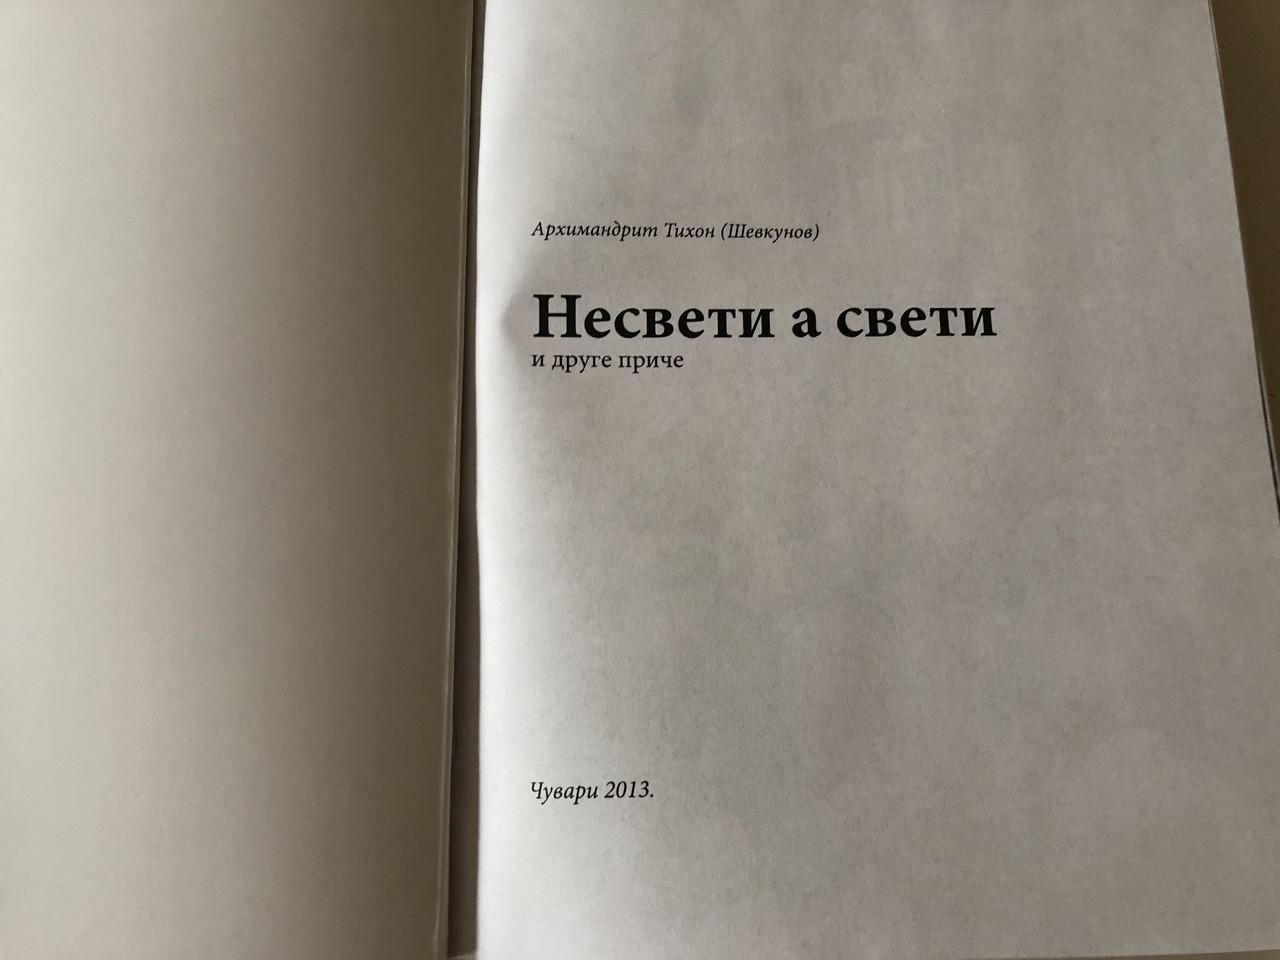 Everyday Saints and Other Stories - Archimandrin Tihon (Schekunov) /  Несвети а Свети - NESVETI A SVETI - A  Tihon (Sevkunov) / Serbian  translation